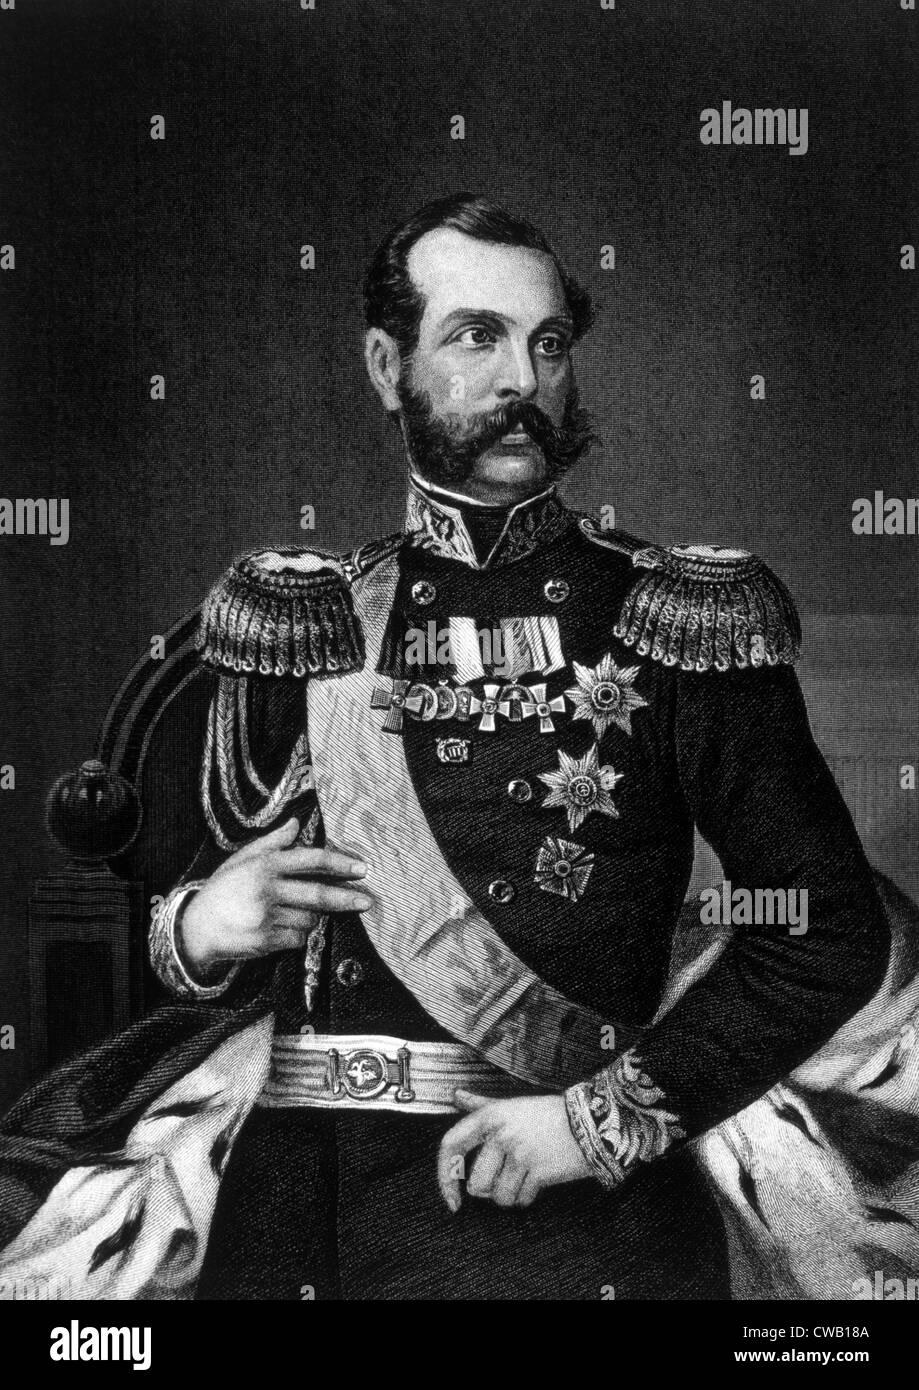 Czar Alexander II (1818-1881), Czar of Russia (1855-1881) - Stock Image